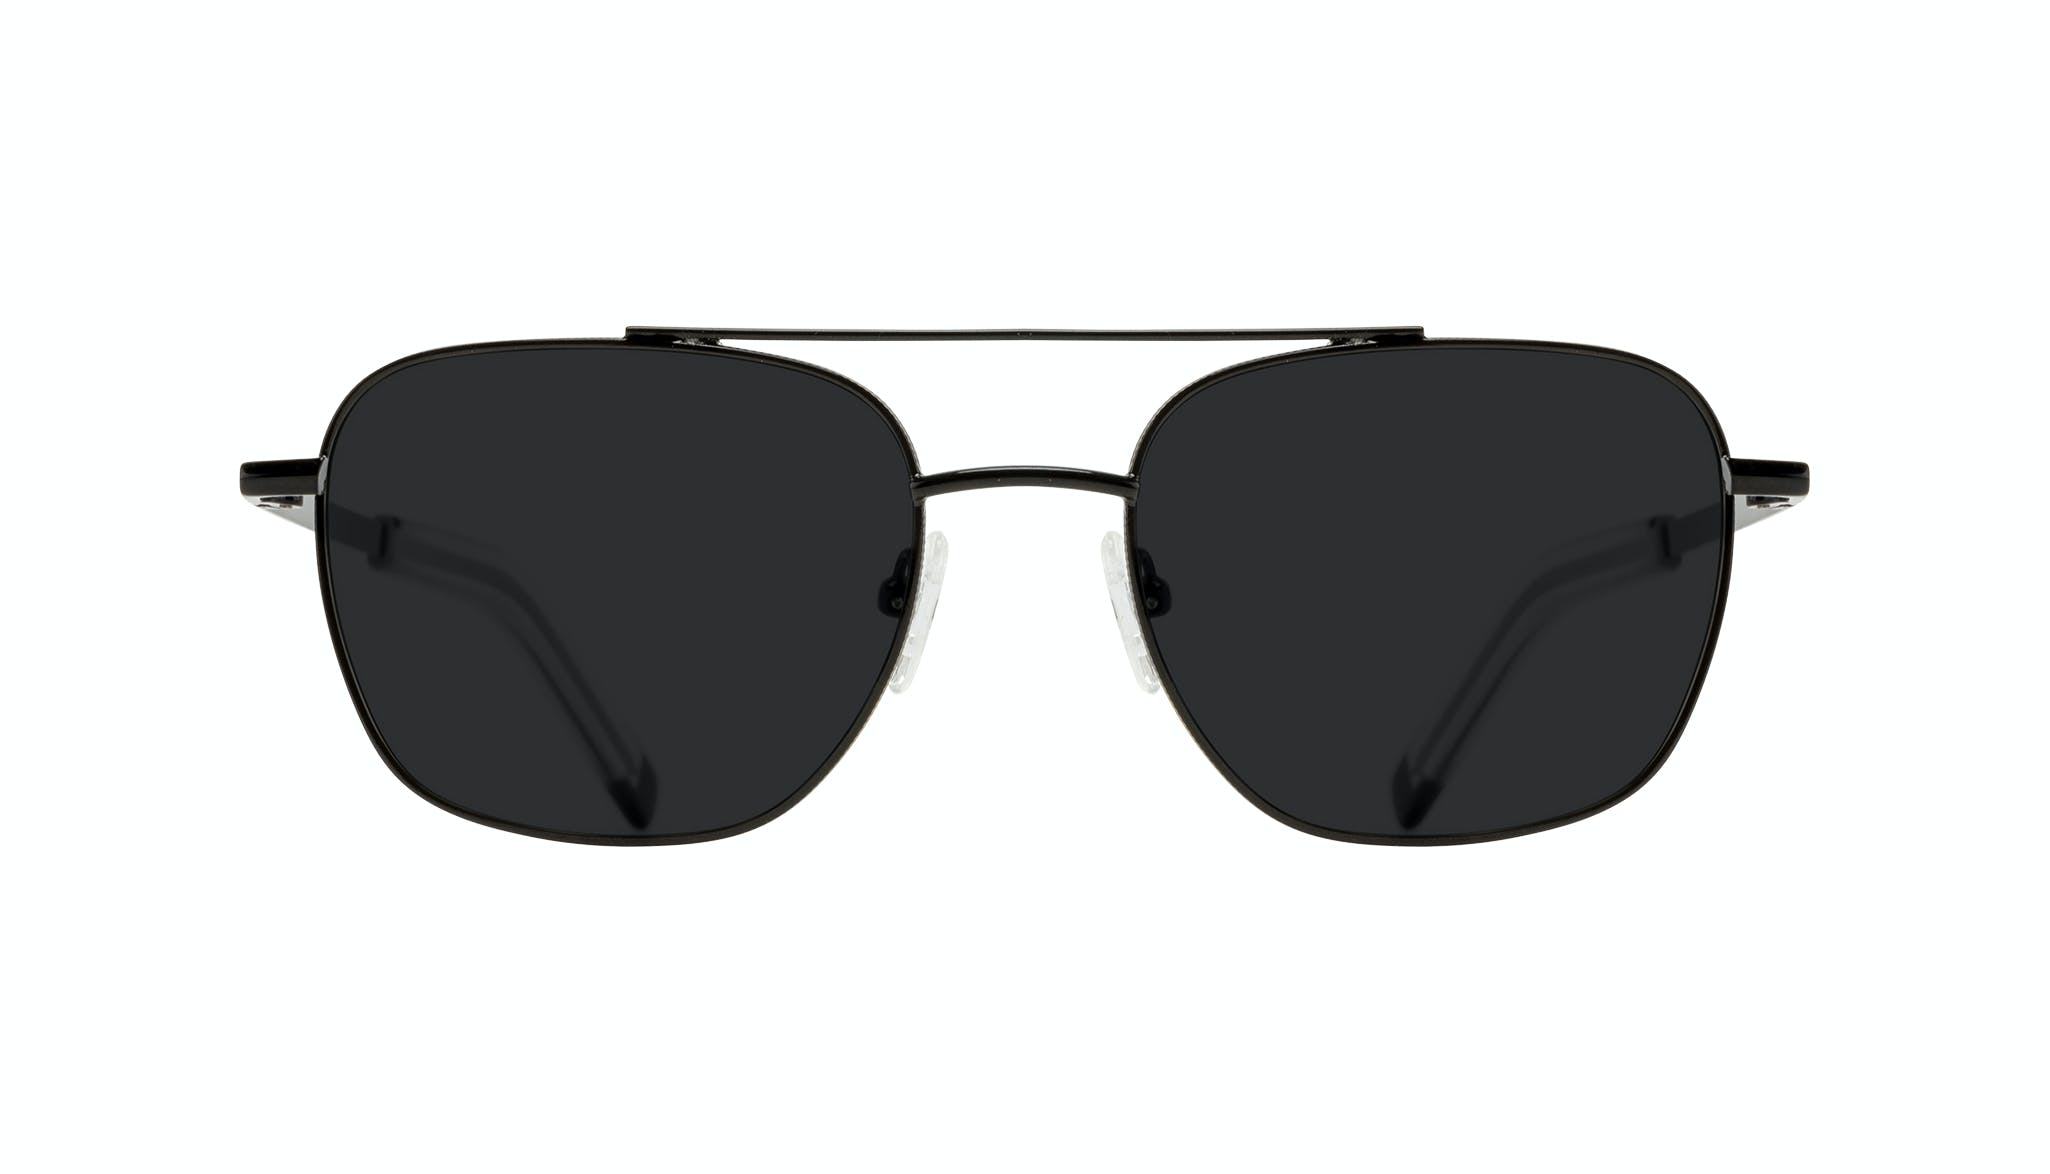 Affordable Fashion Glasses Aviator Sunglasses Men Drift Black